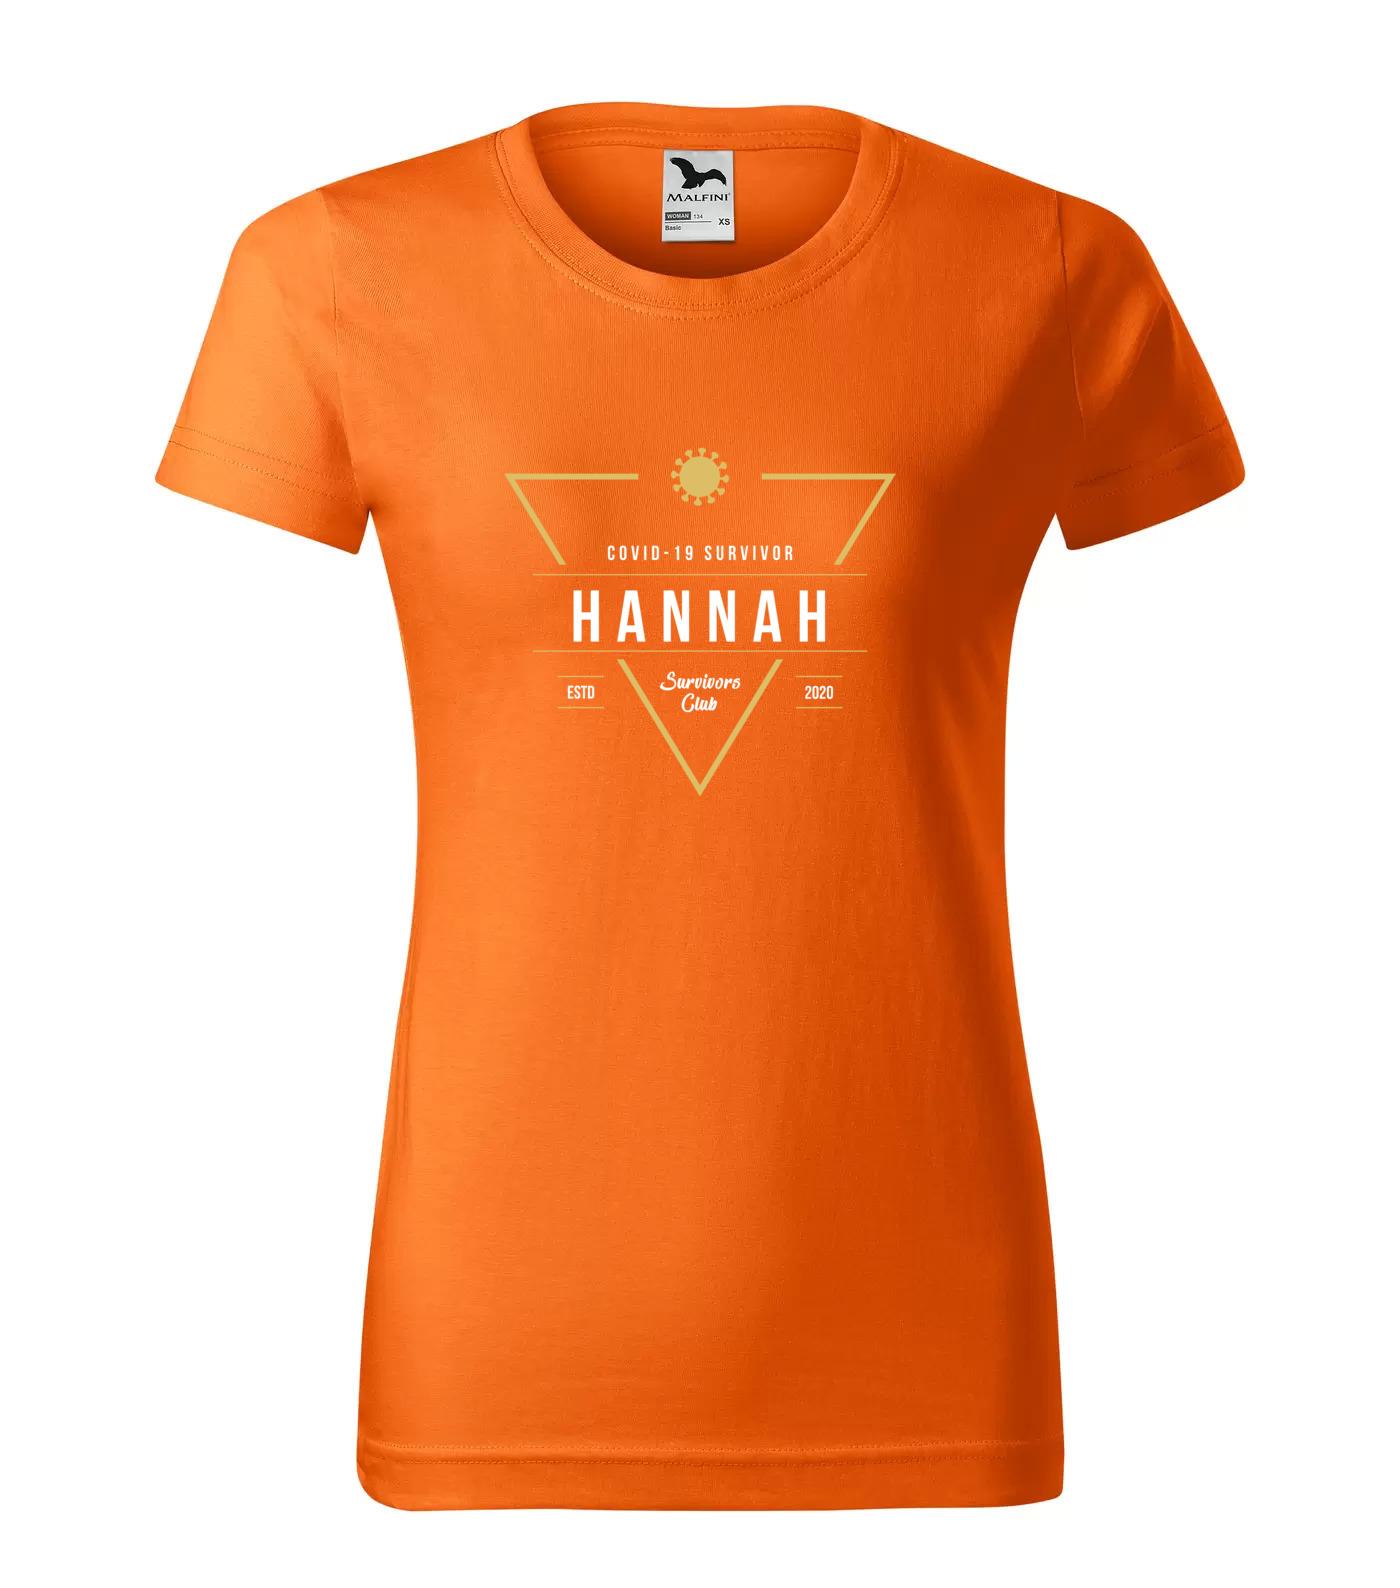 Tričko Survivor Club Hannah